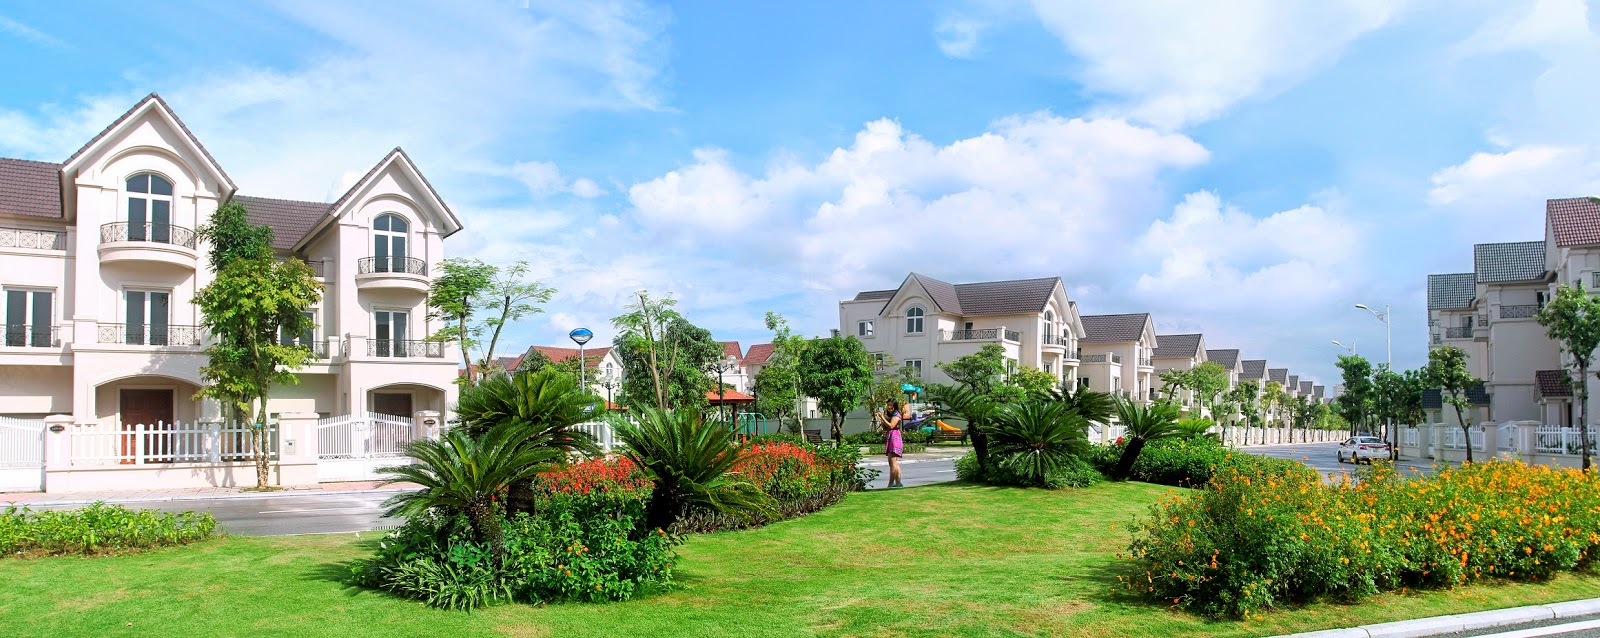 biet-thu-vinhomes-garden-city